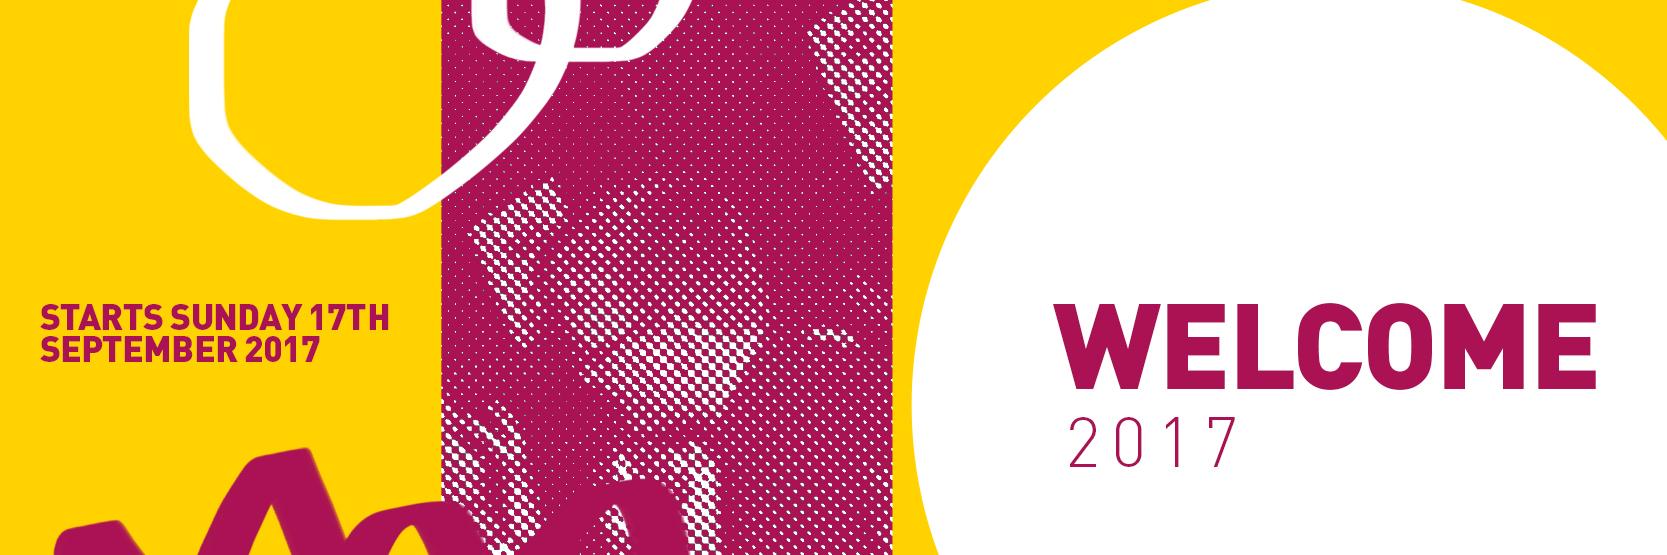 Web banner ww 2017